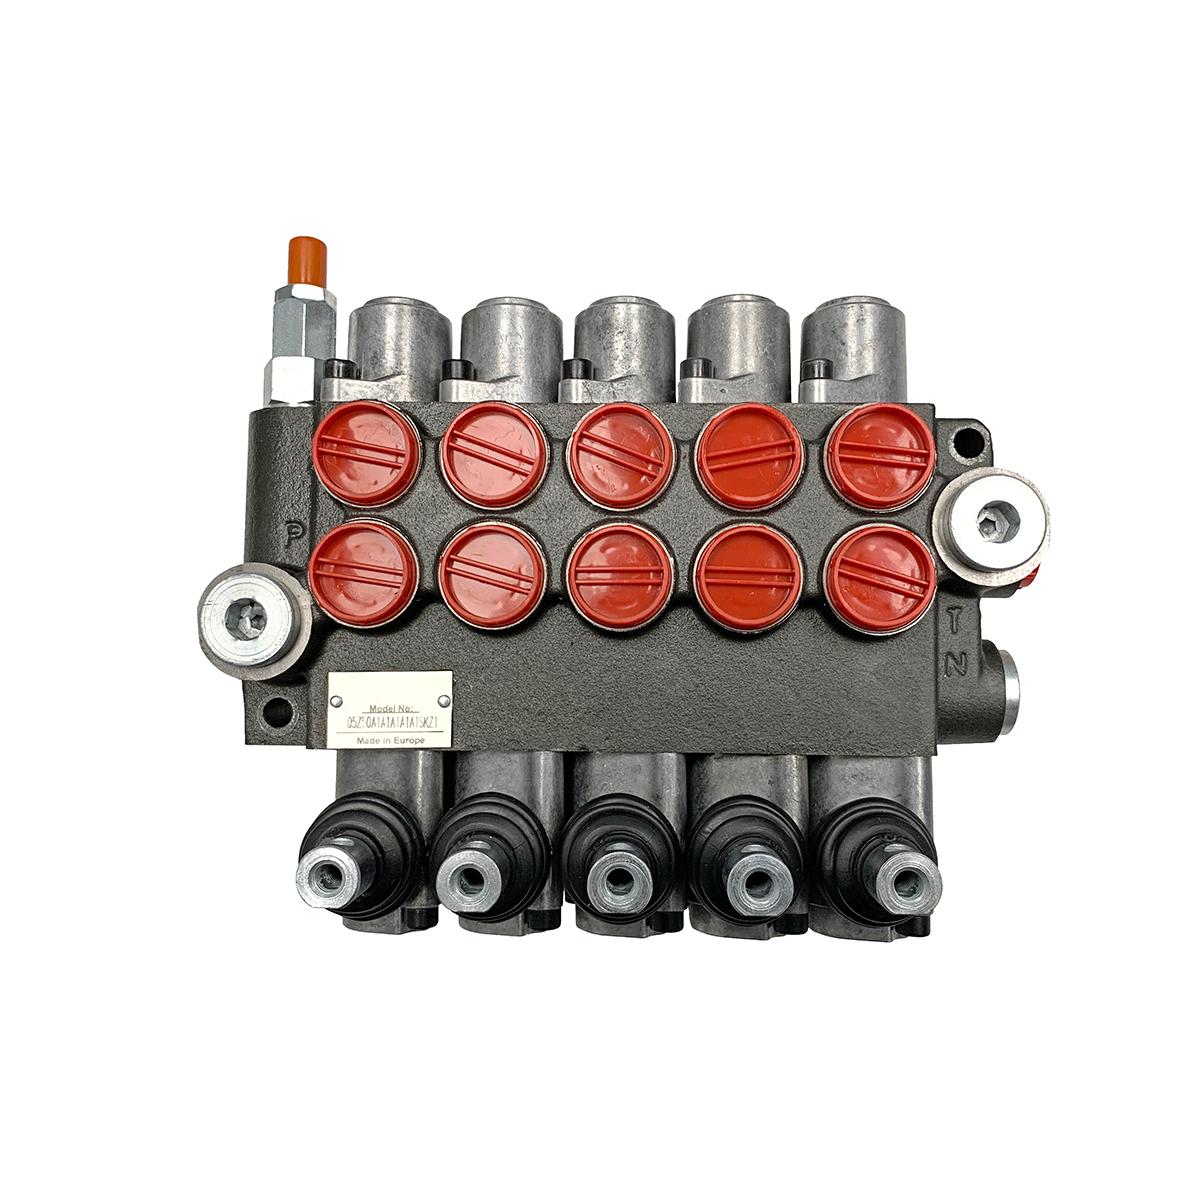 5 spool x 13 GPM hydraulic control valve, monoblock cast iron valve | Magister Hydraulics